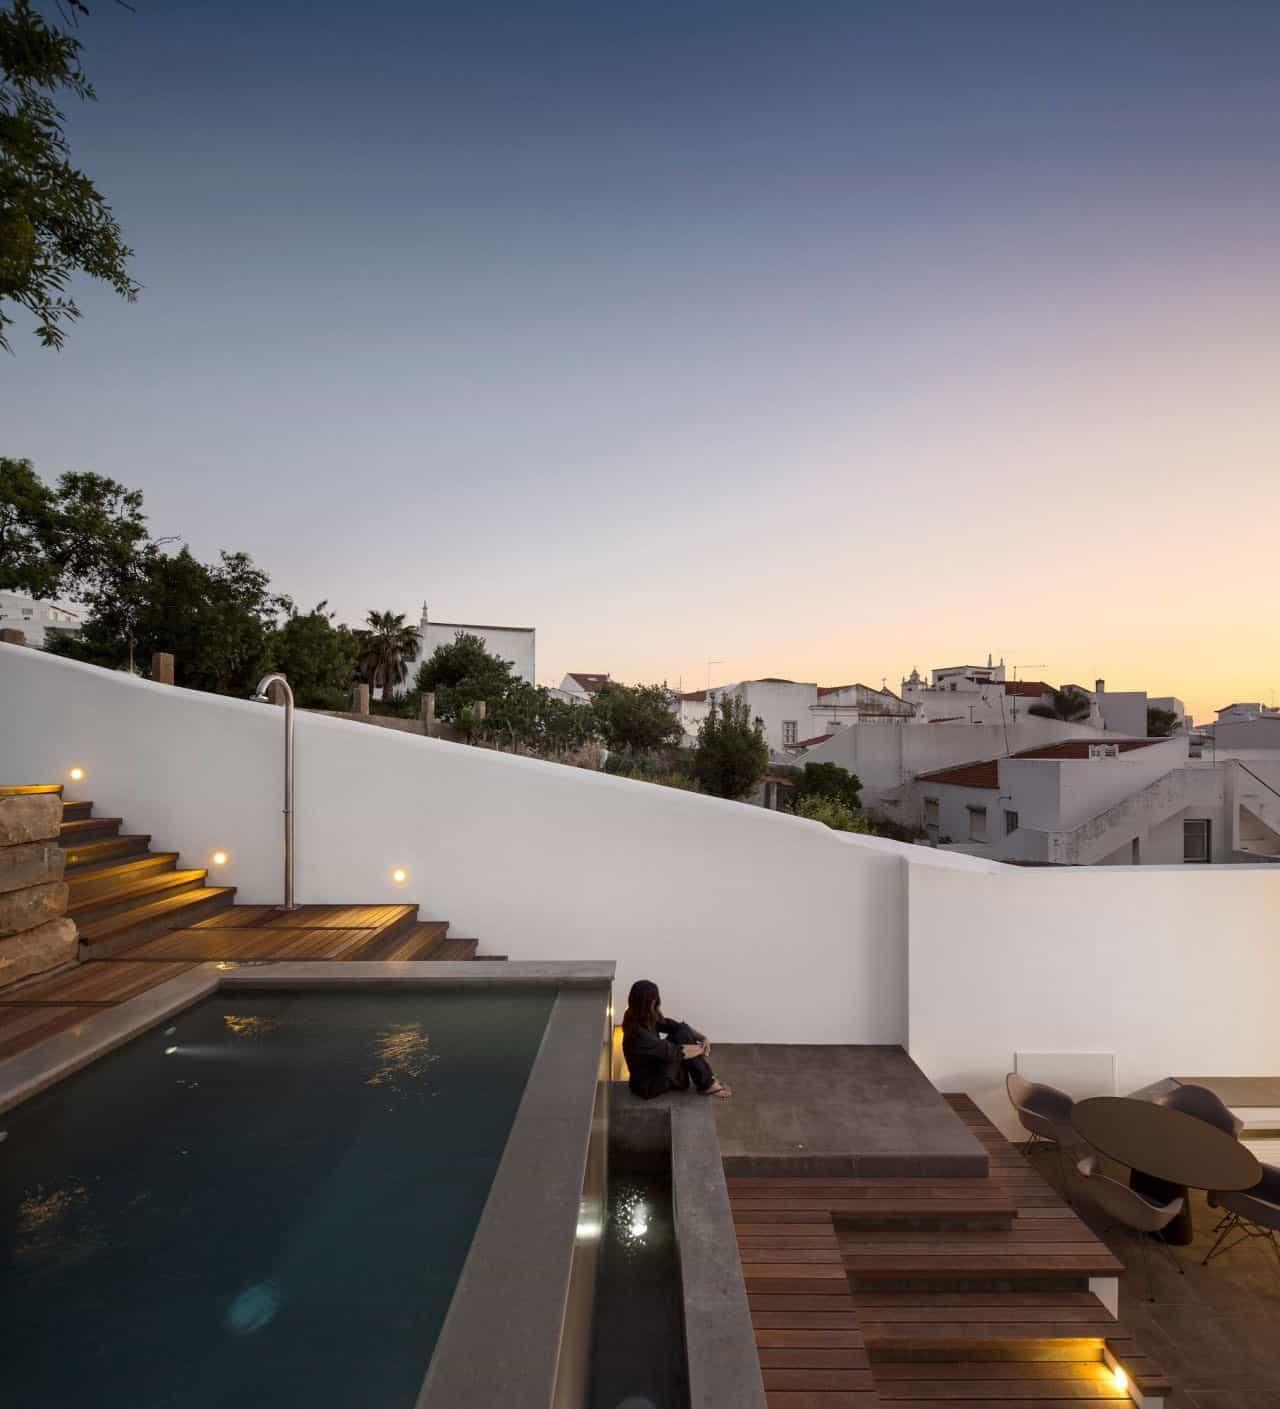 Casa 103 by ultramarino   marlene uldschmidt architects